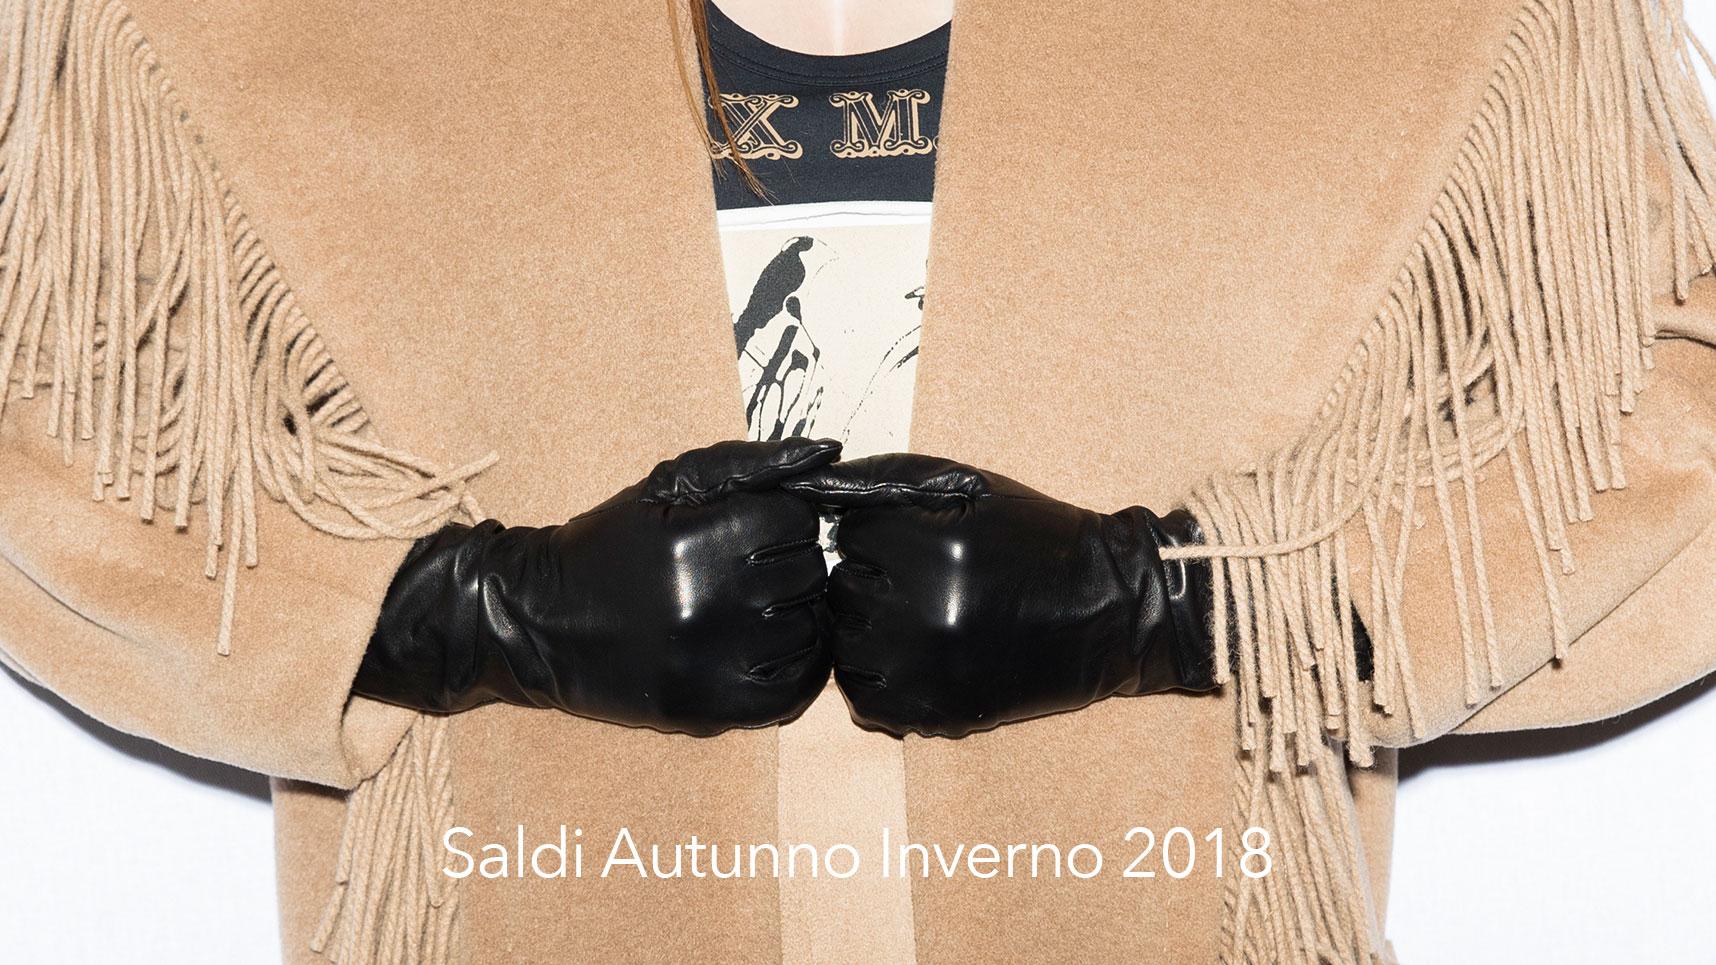 SALDI AUTUNNO INVERNO 2018